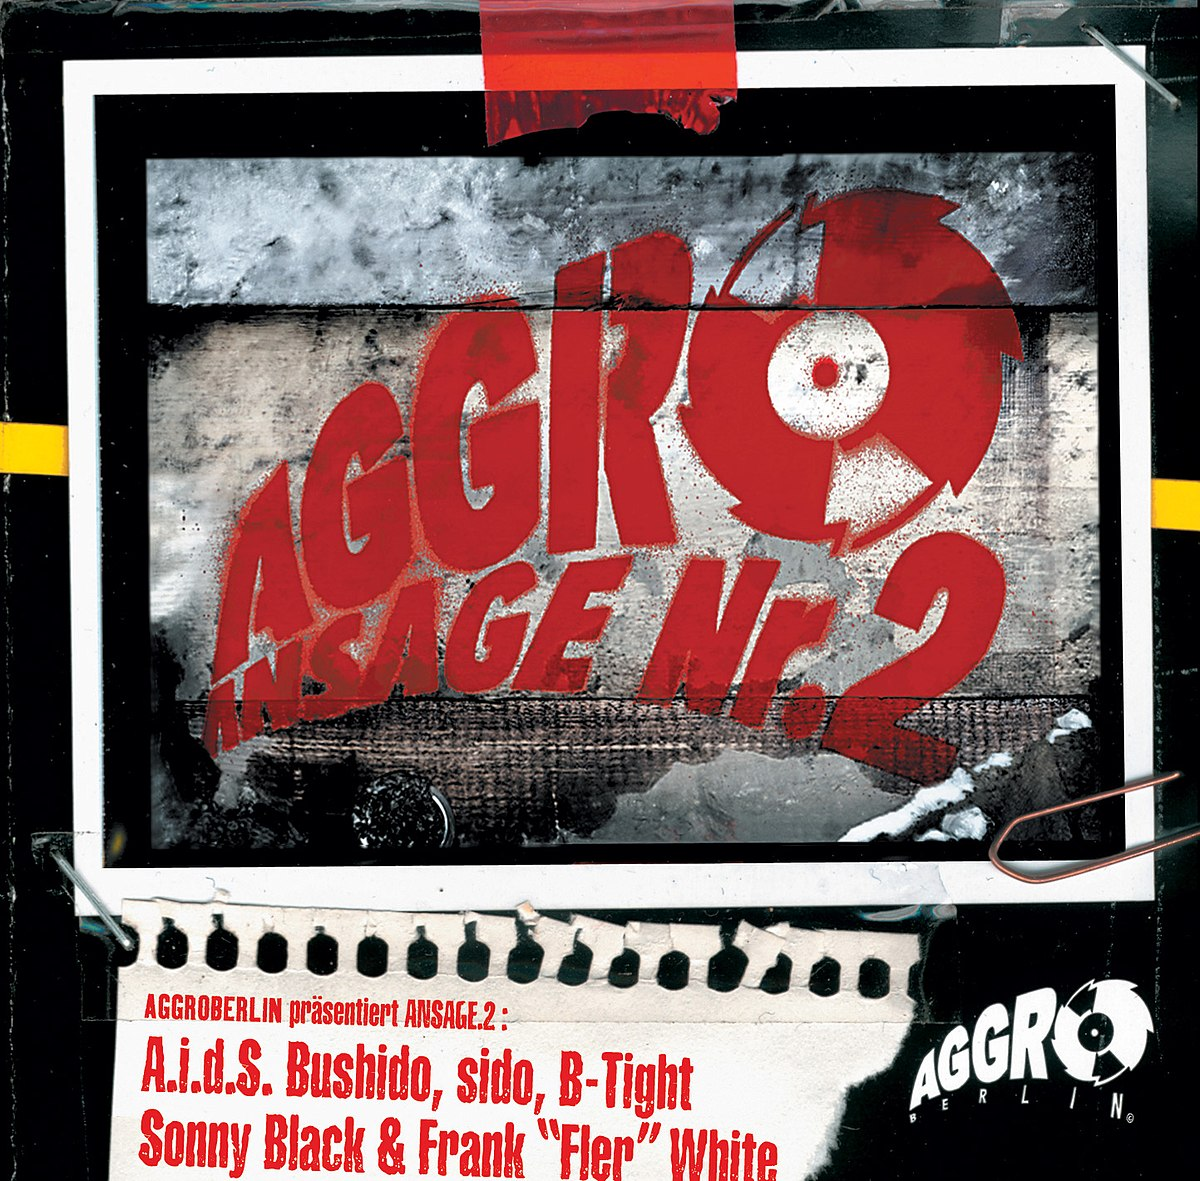 Video's van Aggro berlin aggro ansage nr. 2